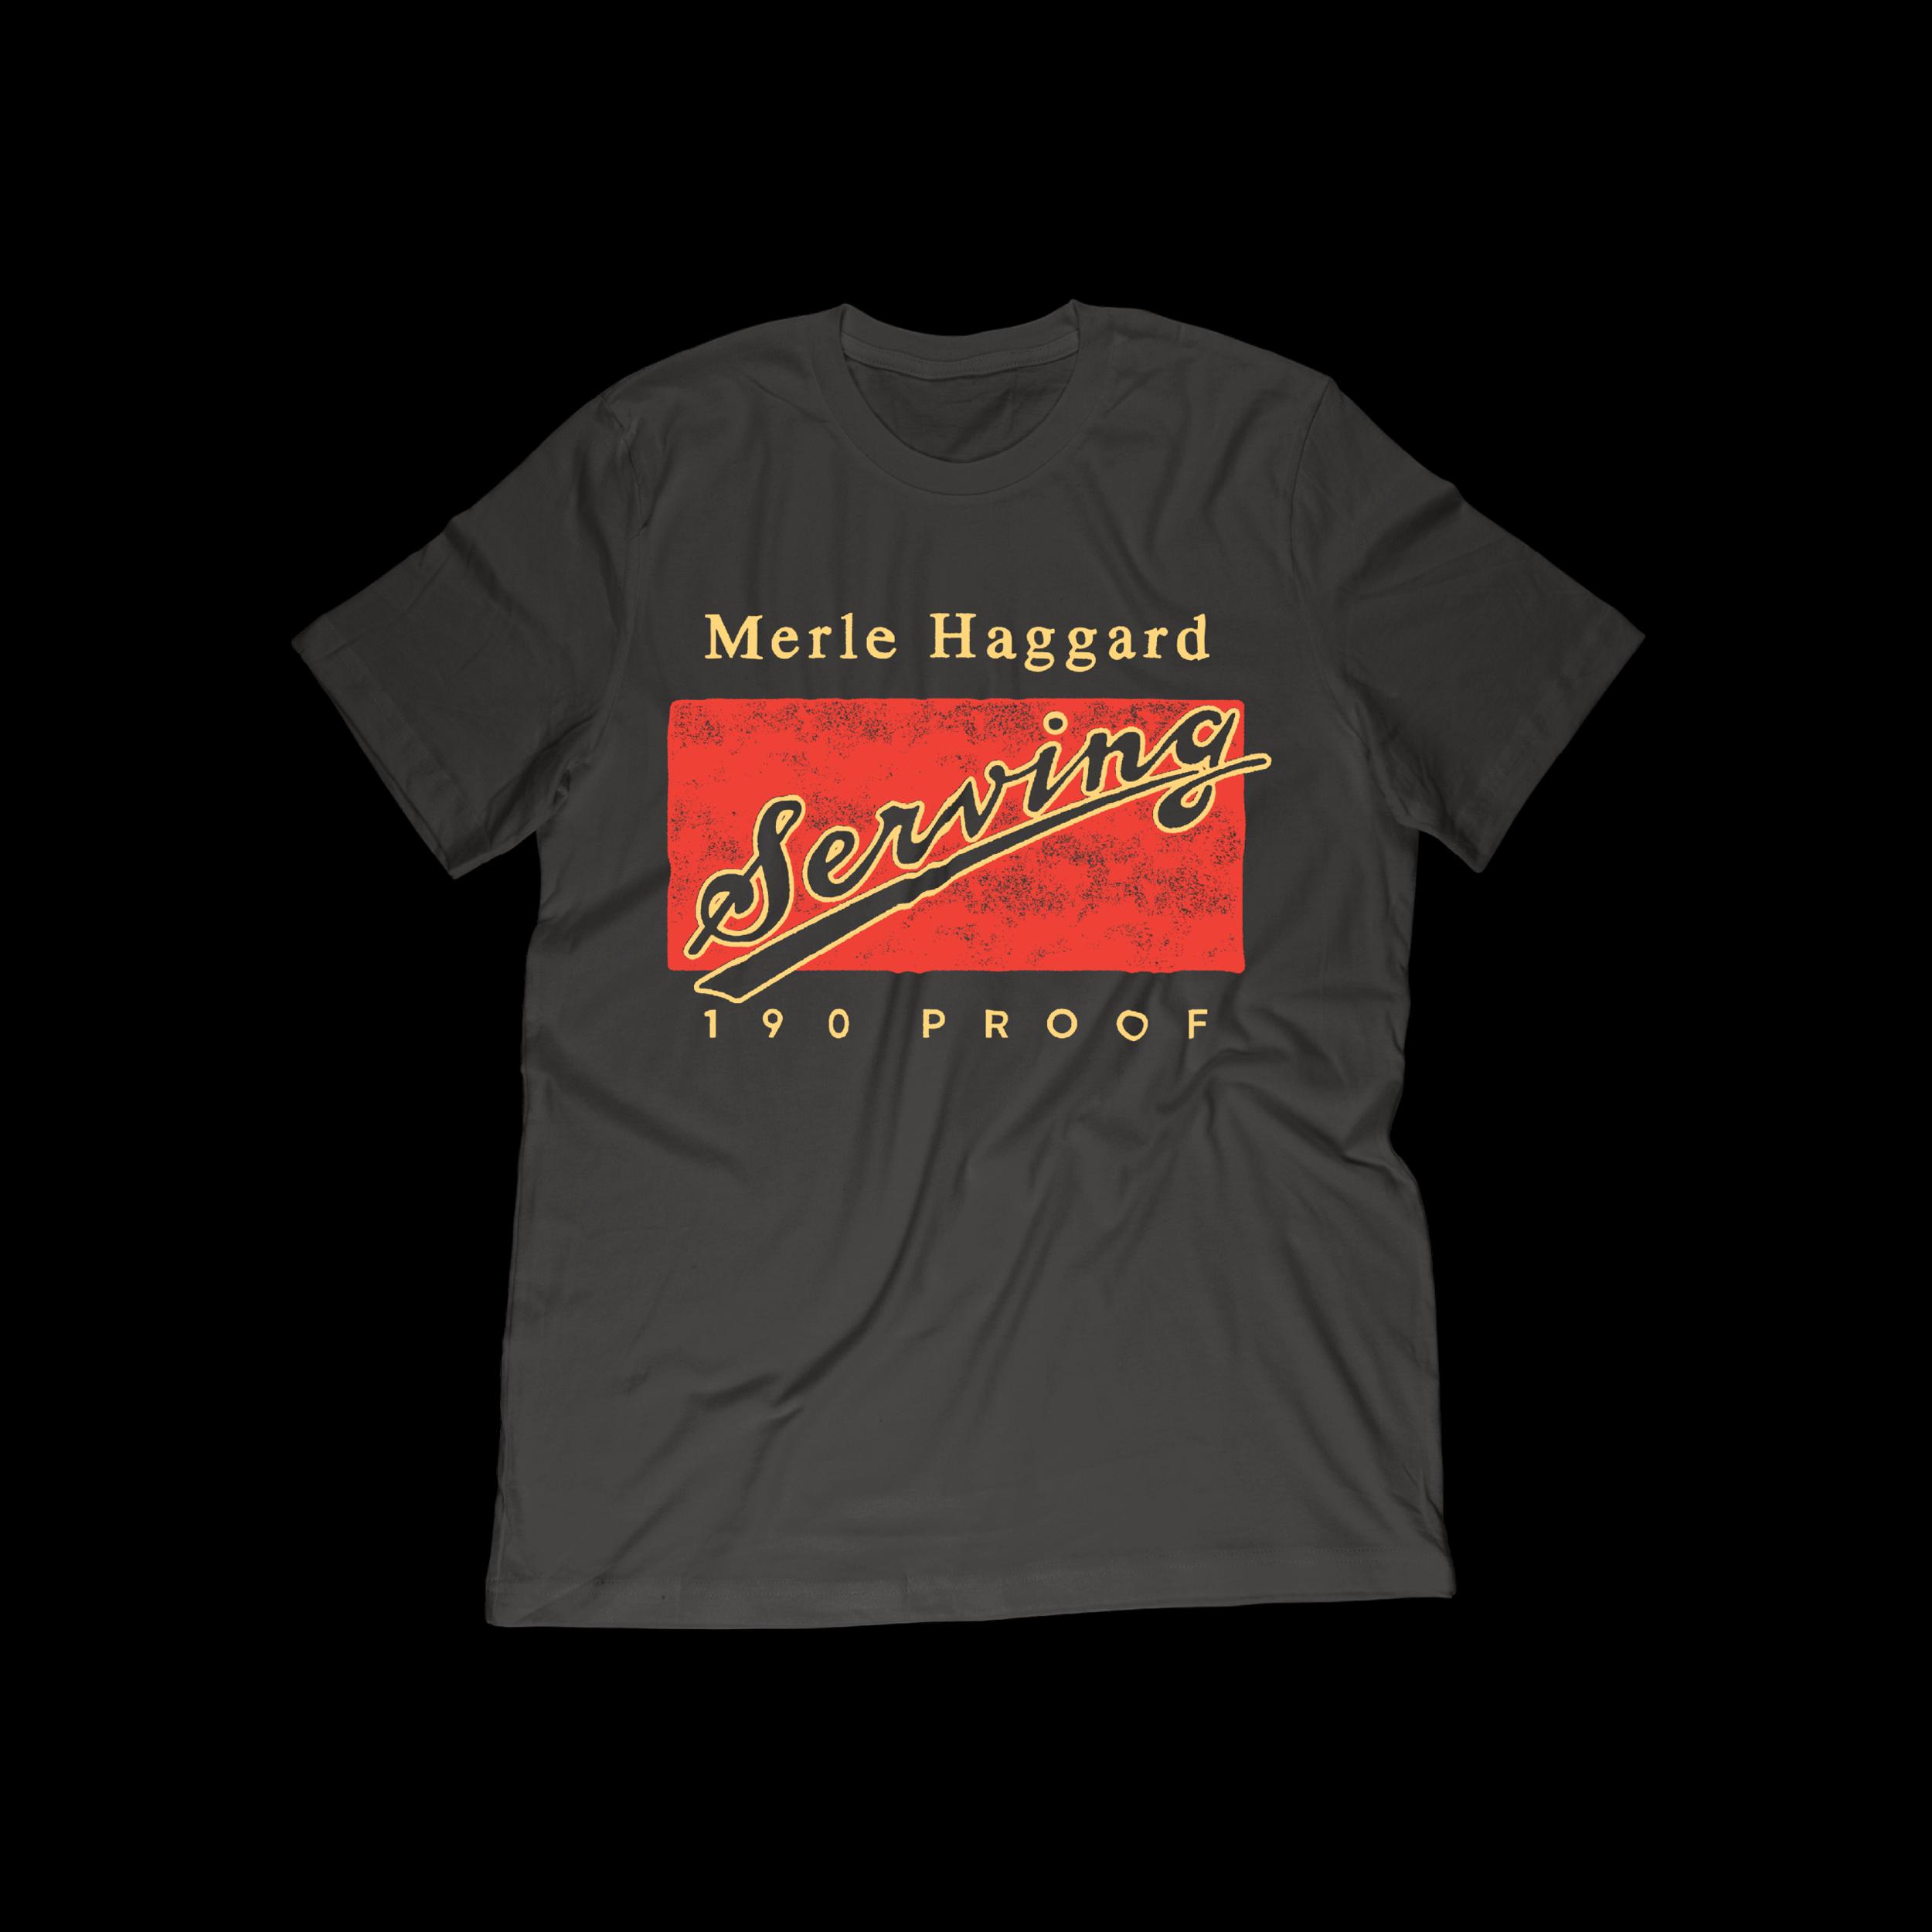 MerleHaggard-MockUps-0527192.png